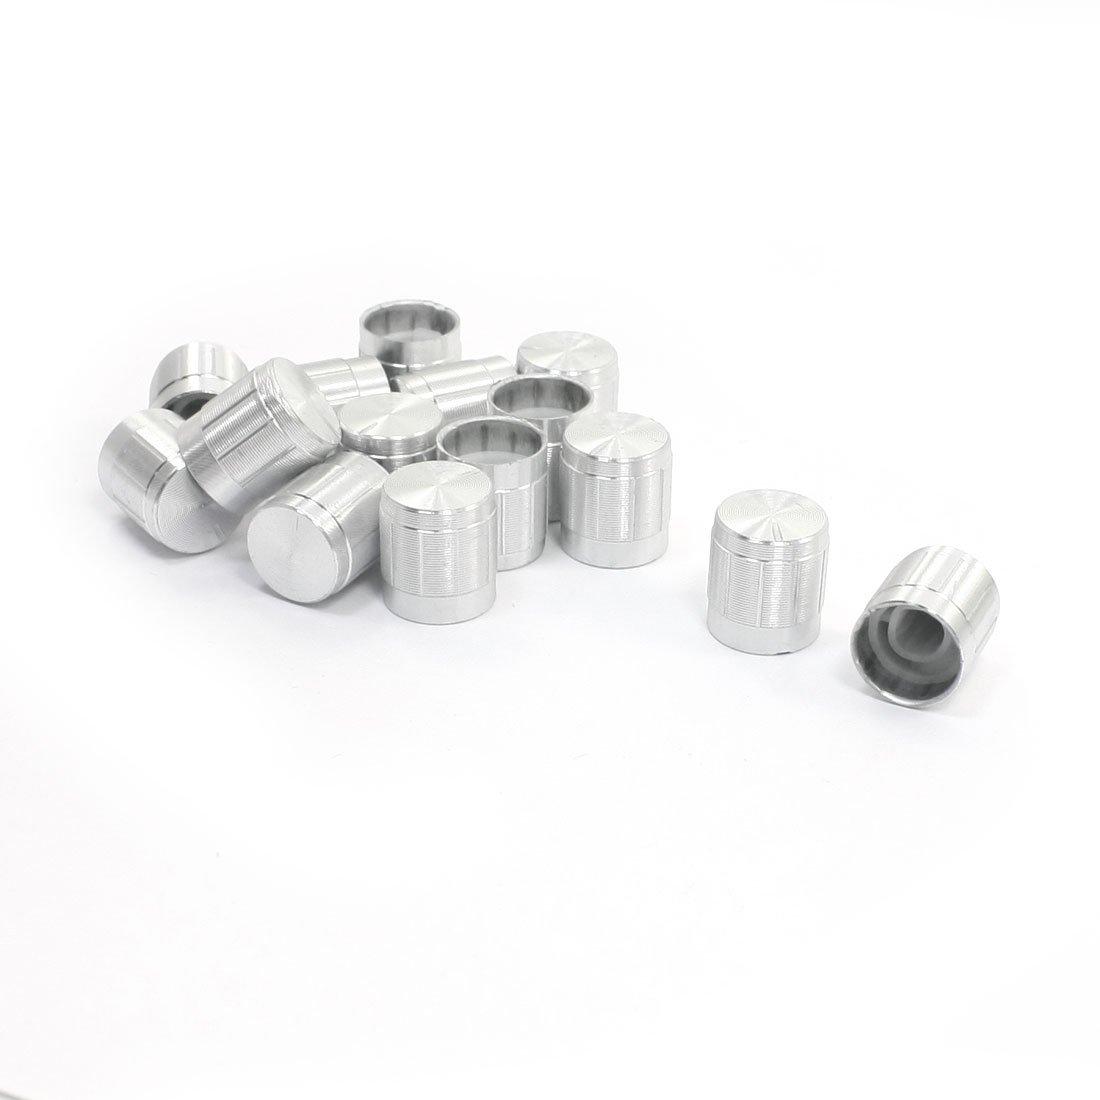 6mm Shaft Potentiometer Volume Control Cylinder Rotary Knob 15pcs